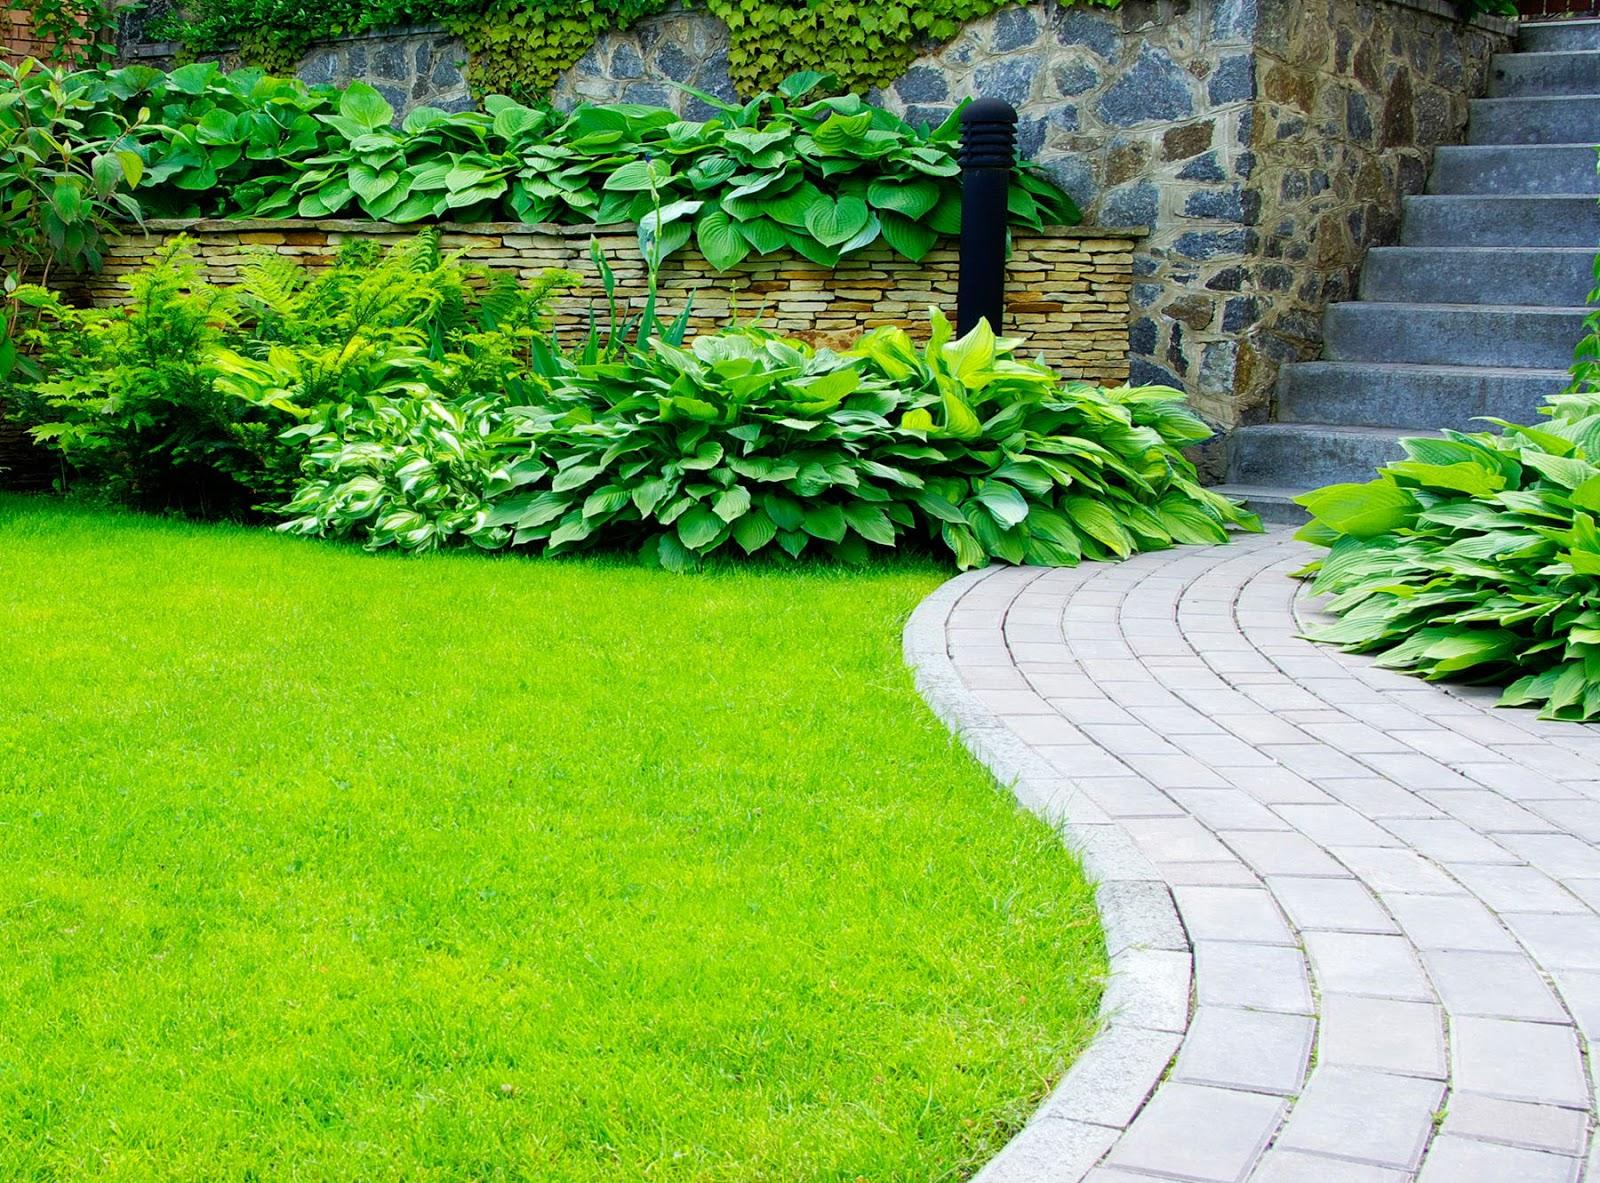 Im gene experience 9 fotos de jardines dise o exterior - Plantas de jardin fotos ...